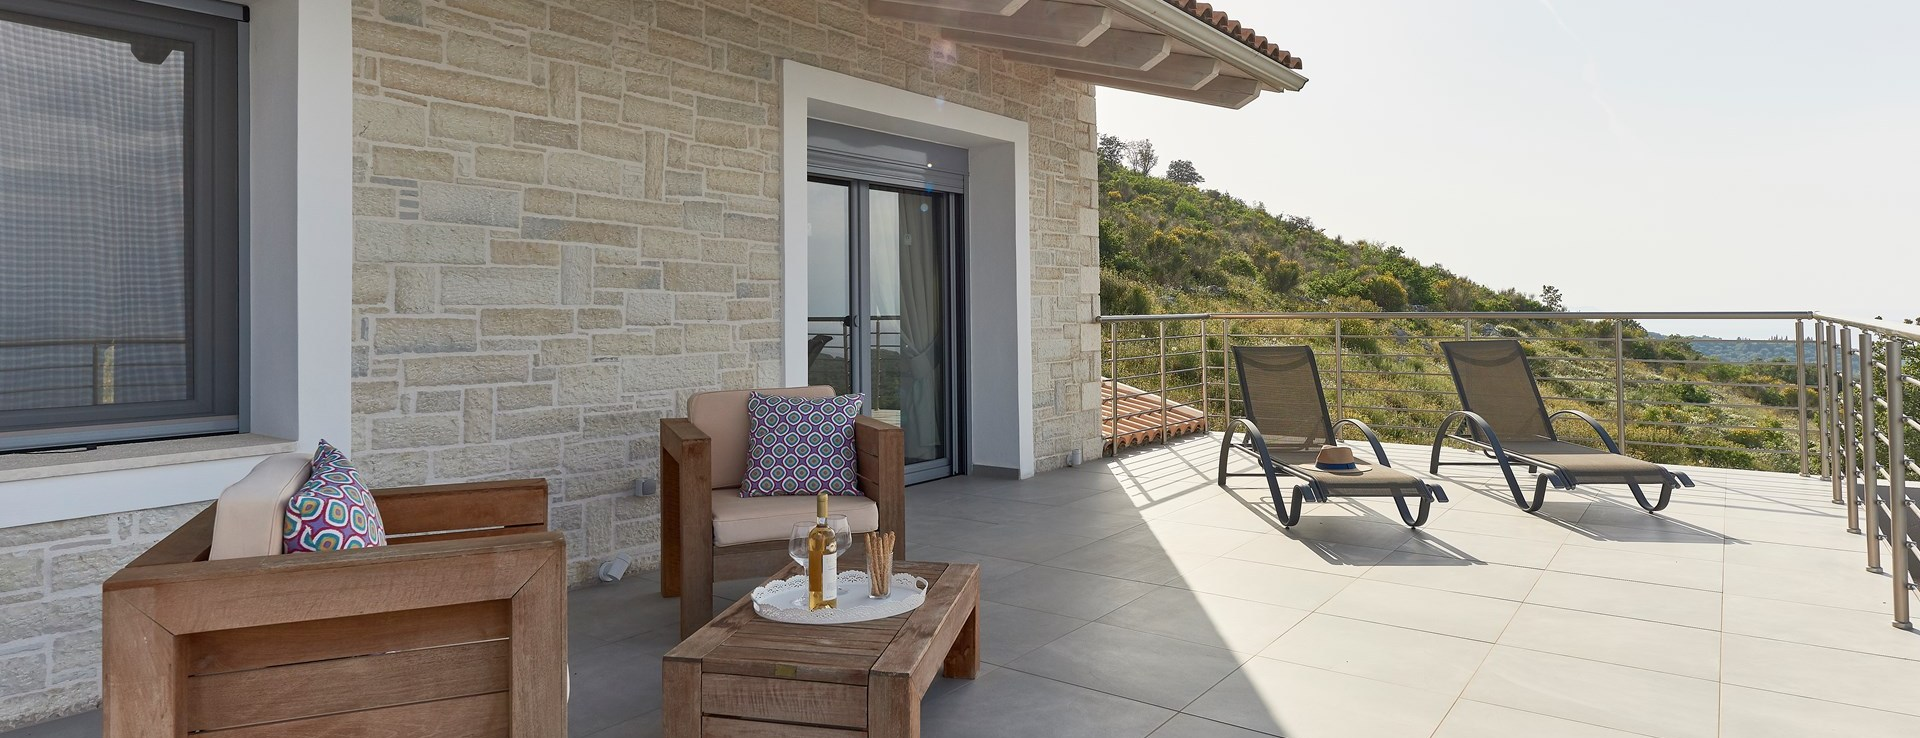 sea-view-villa-corfu-roof-terrace